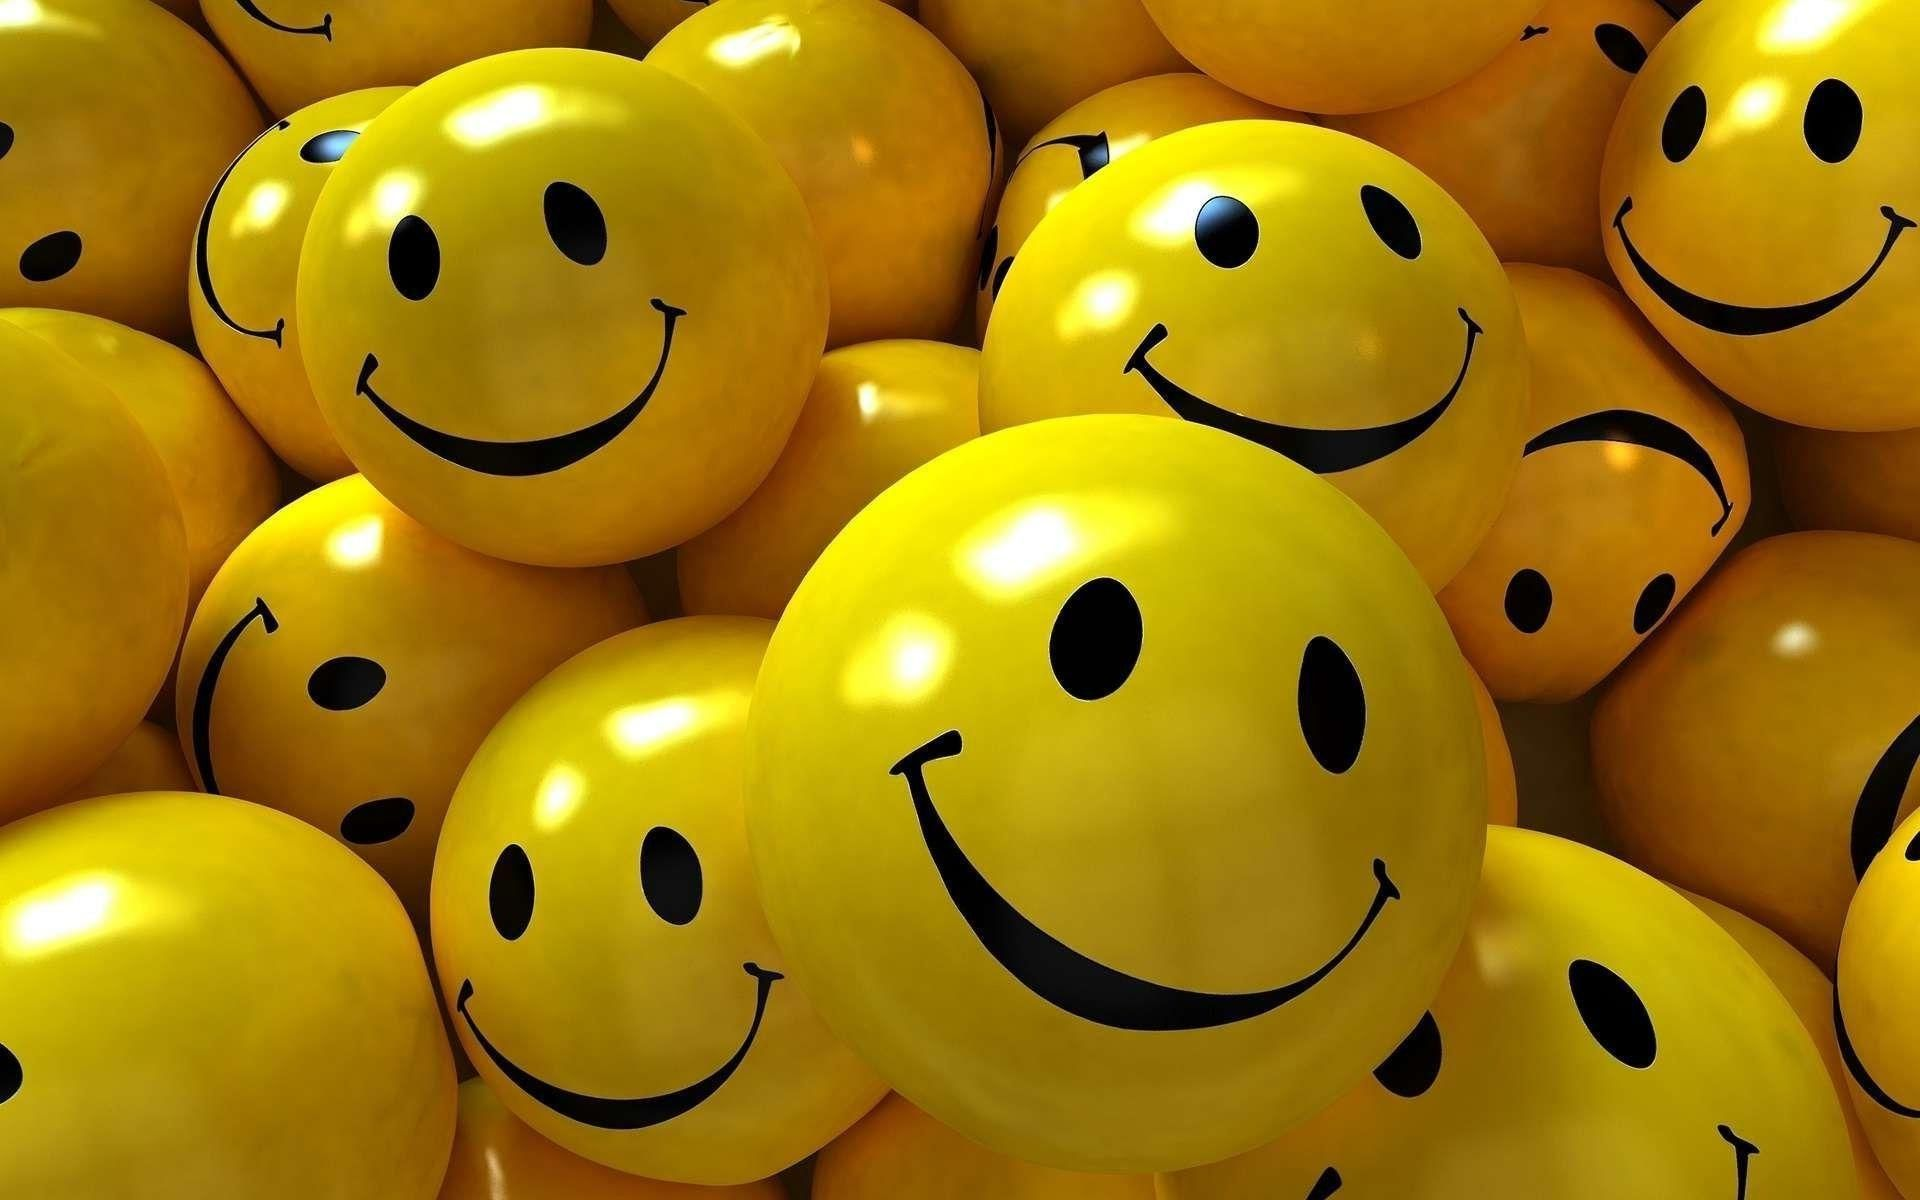 Smilies Wallpaper Desktop Happy Wallpaper Smile Images Whatsapp Dp Images